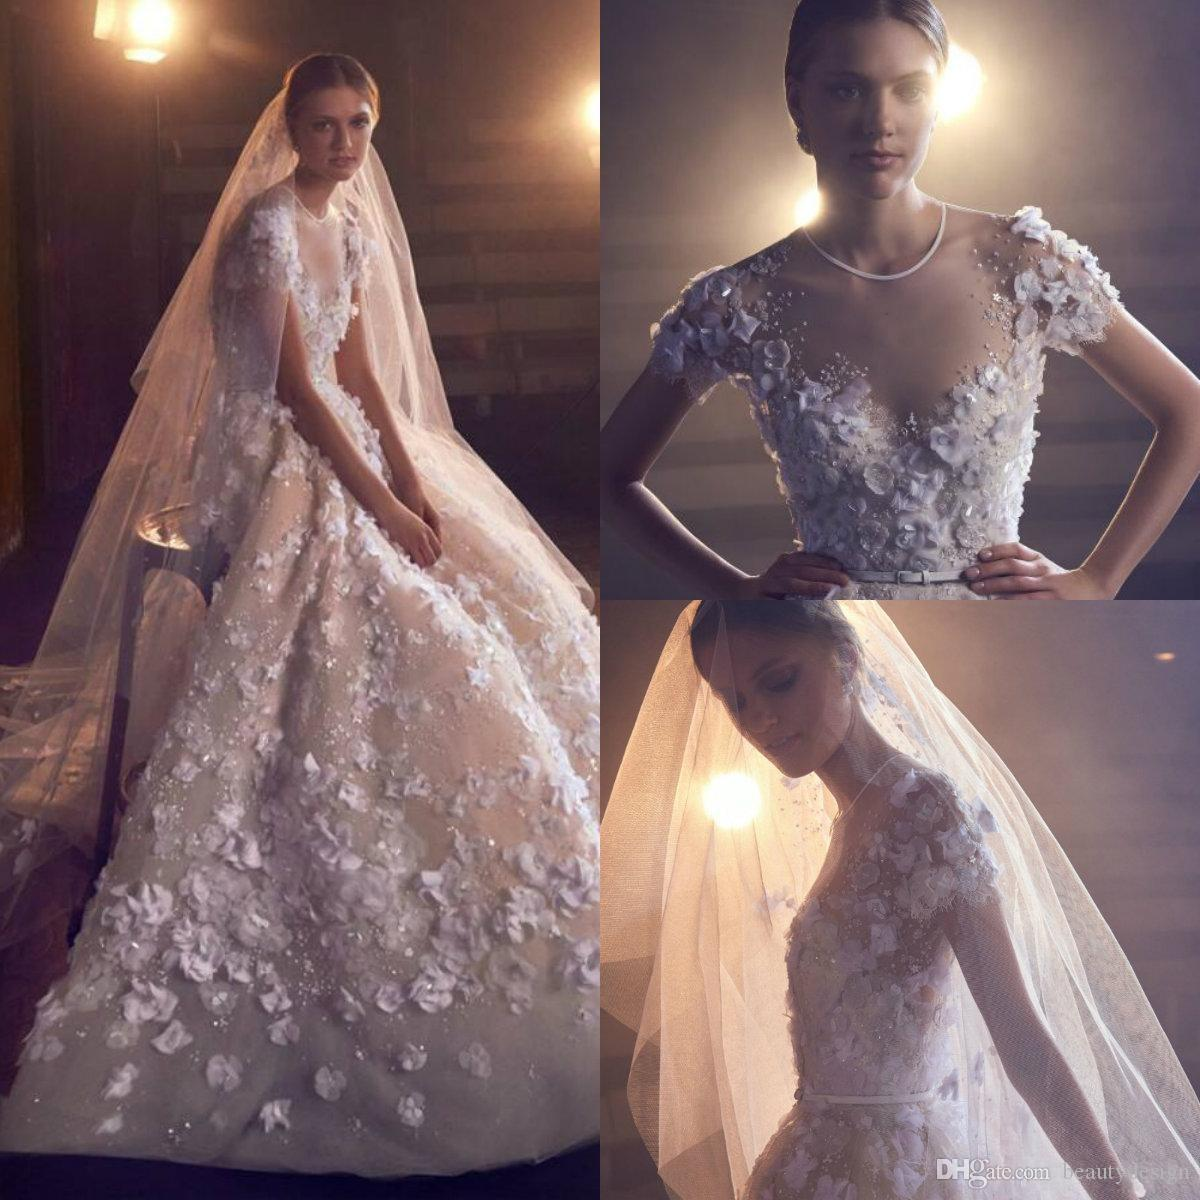 Charming Wedding Dresses Jewel Neck Lace 3D Floral Appliqued Beaded A Line Beach Wedding Dress Short Sleeve Vestidos De Novia